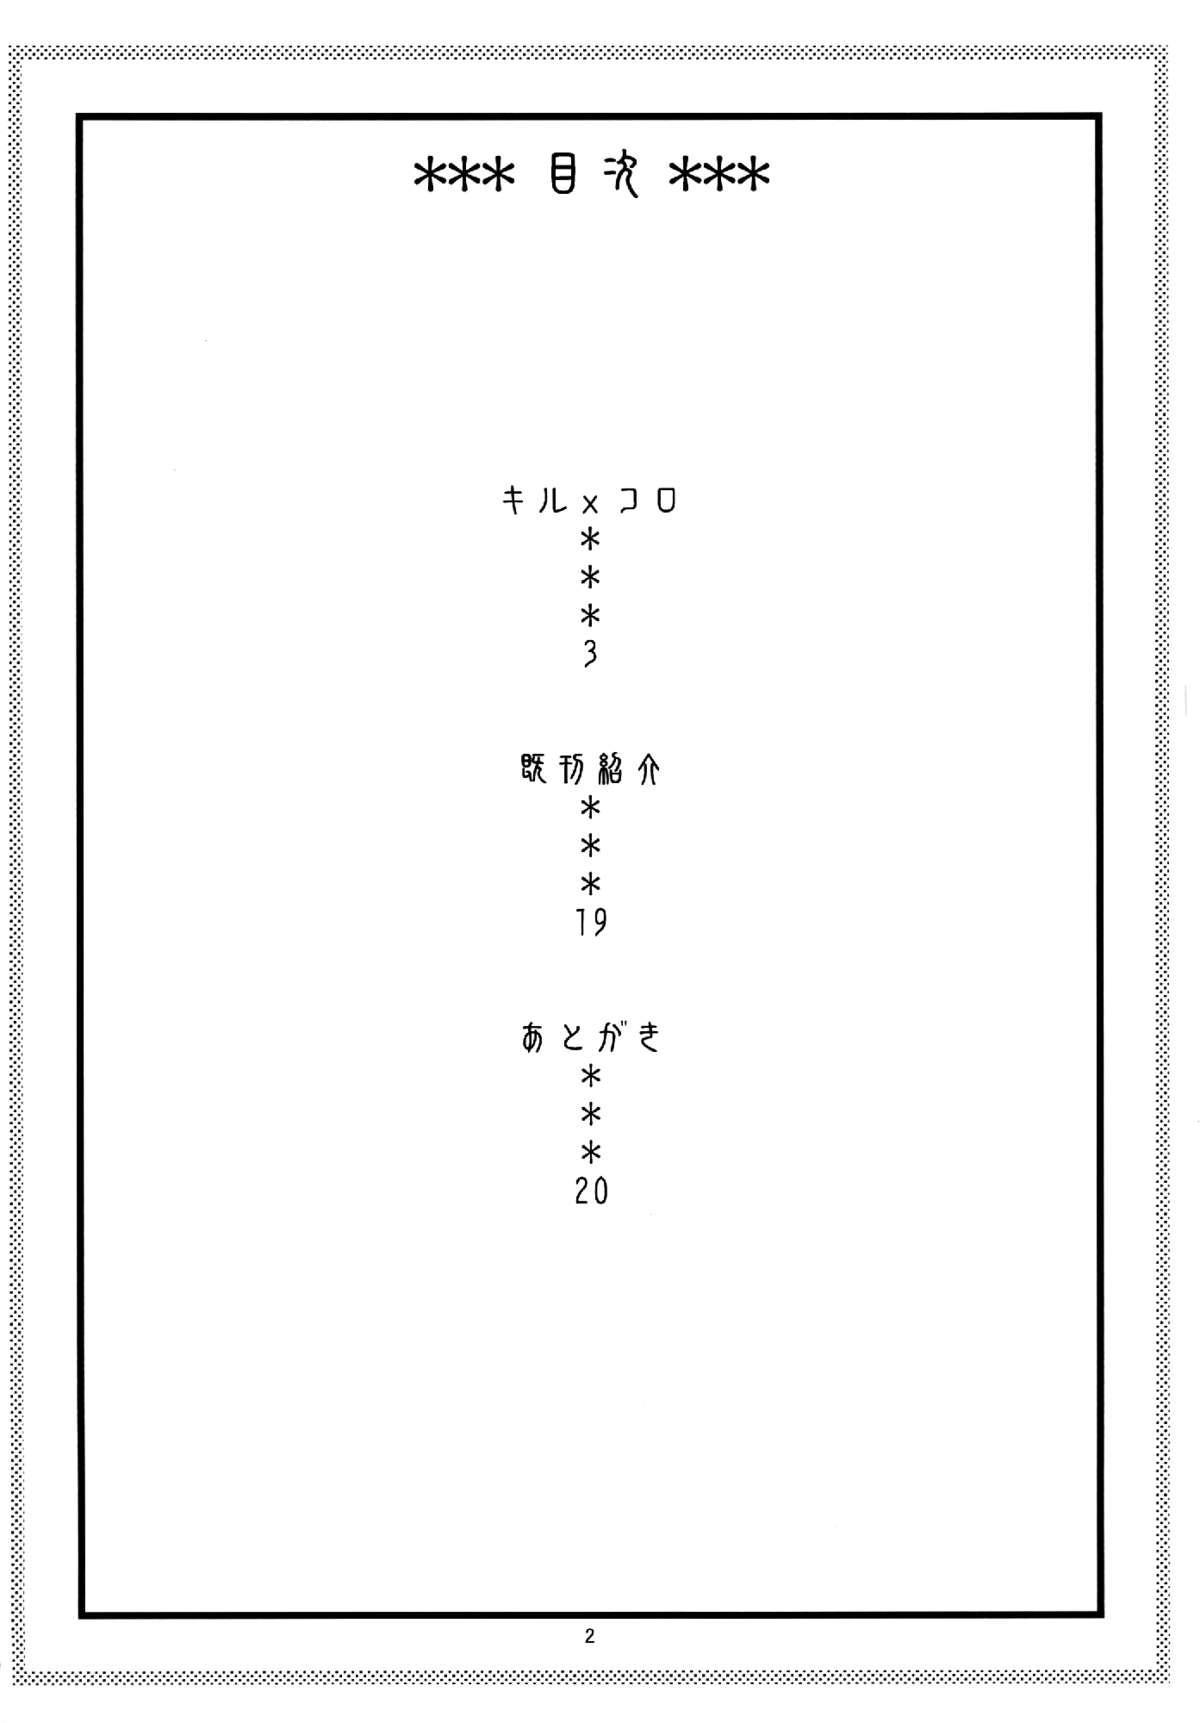 Kiru × Koro 3